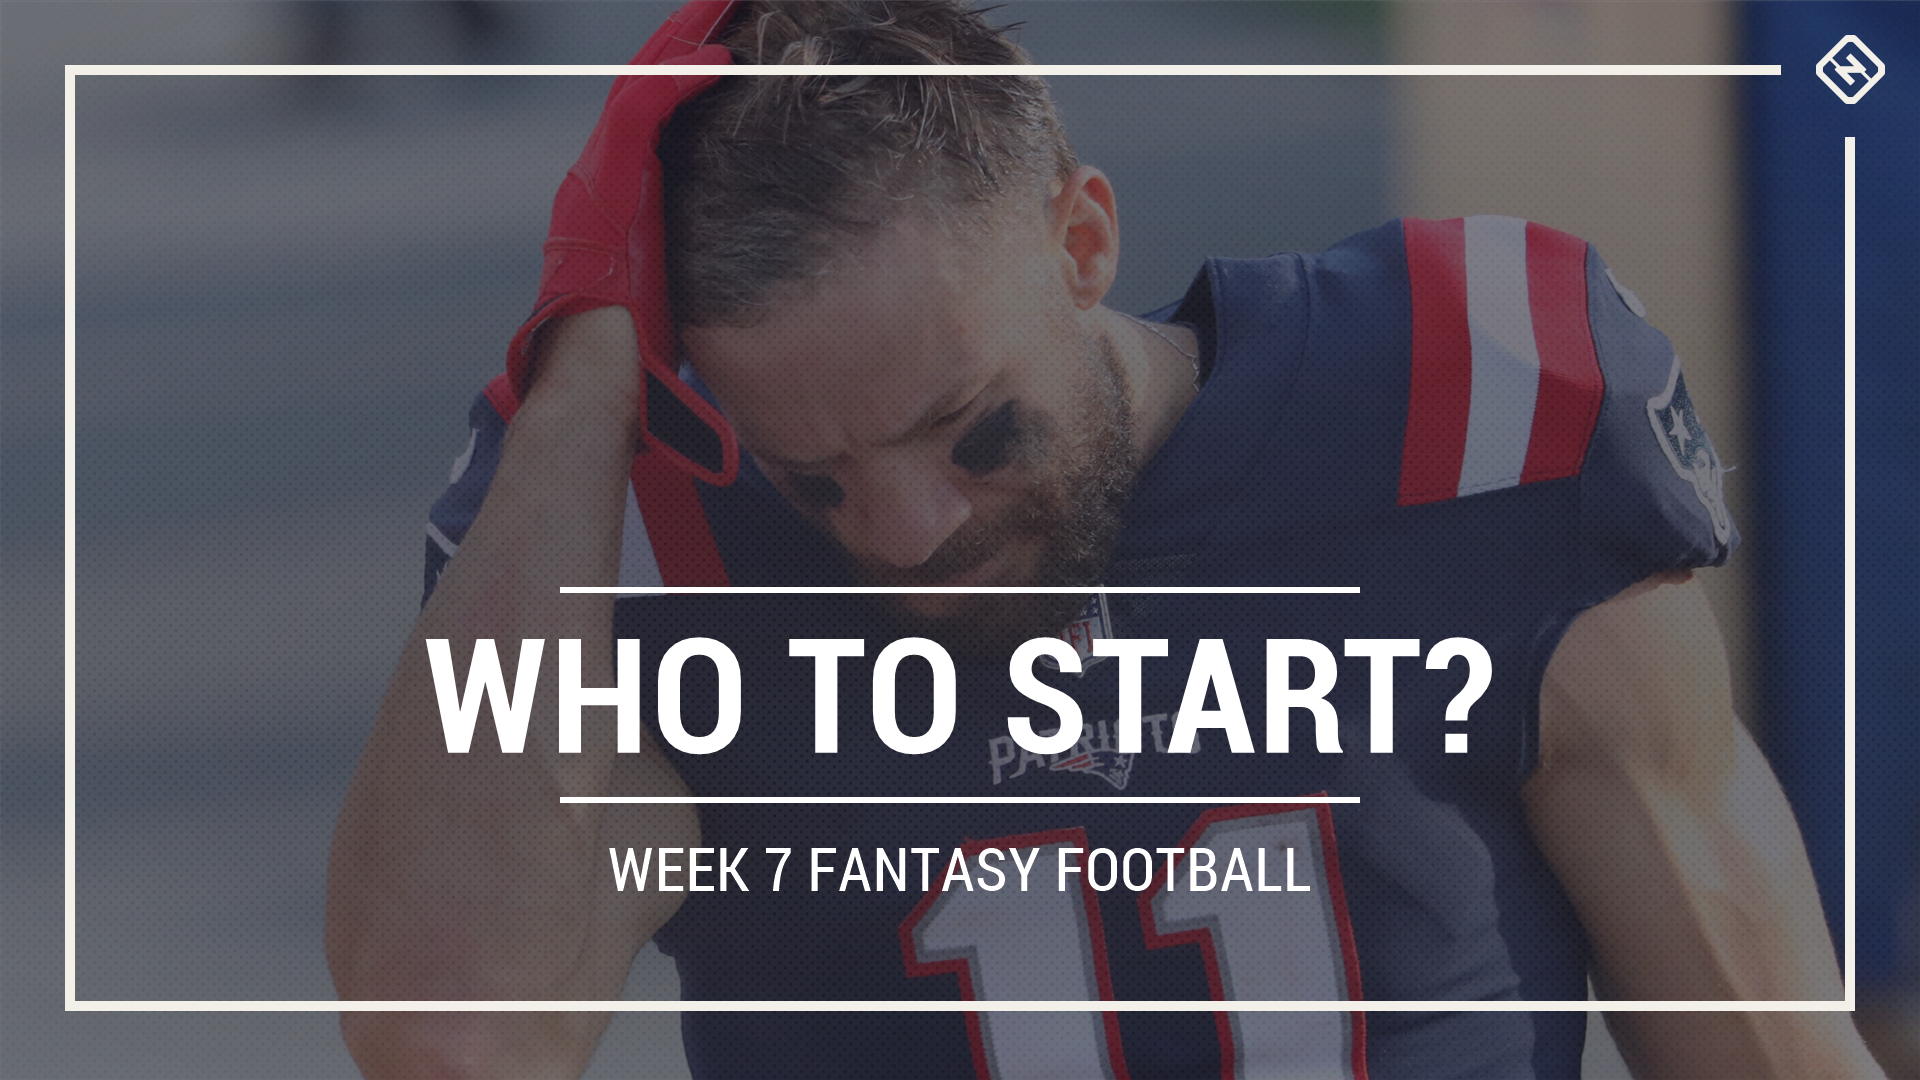 Who to start in fantasy football: Week 7 rankings, start-sit advice for PPR, Standard, Superflex scoring